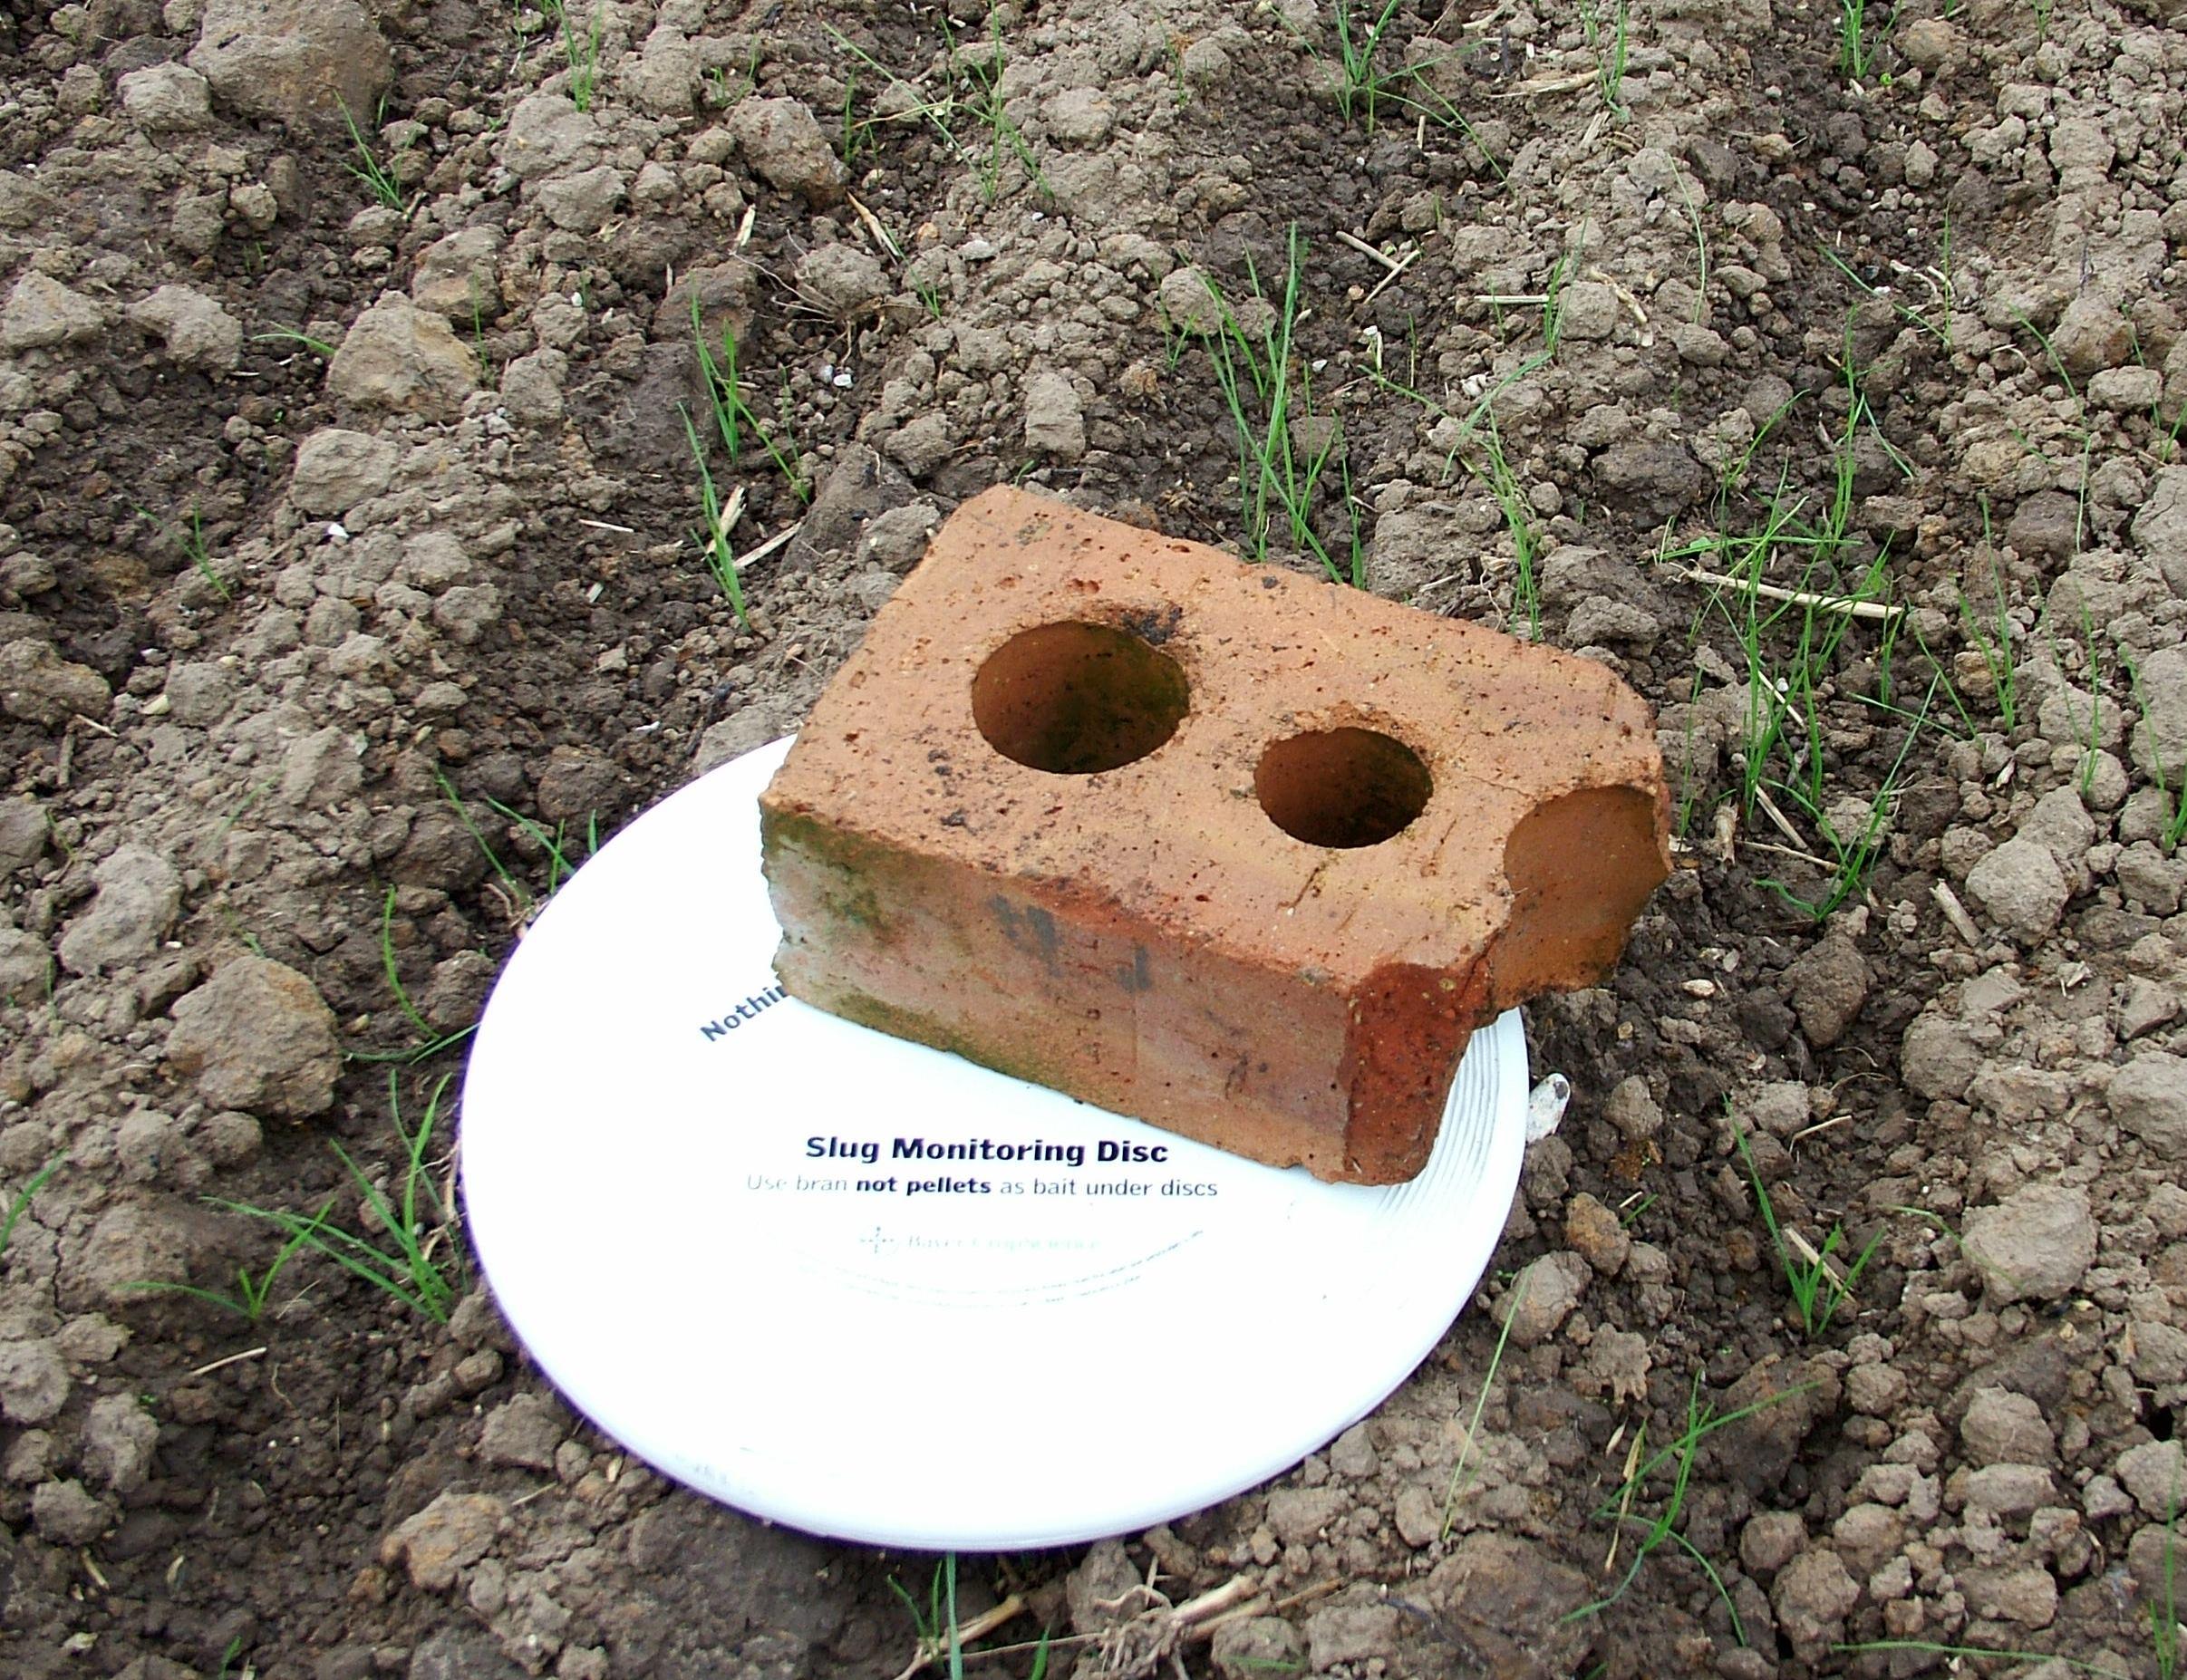 Effective slug control strategies for an ever-increasing problem